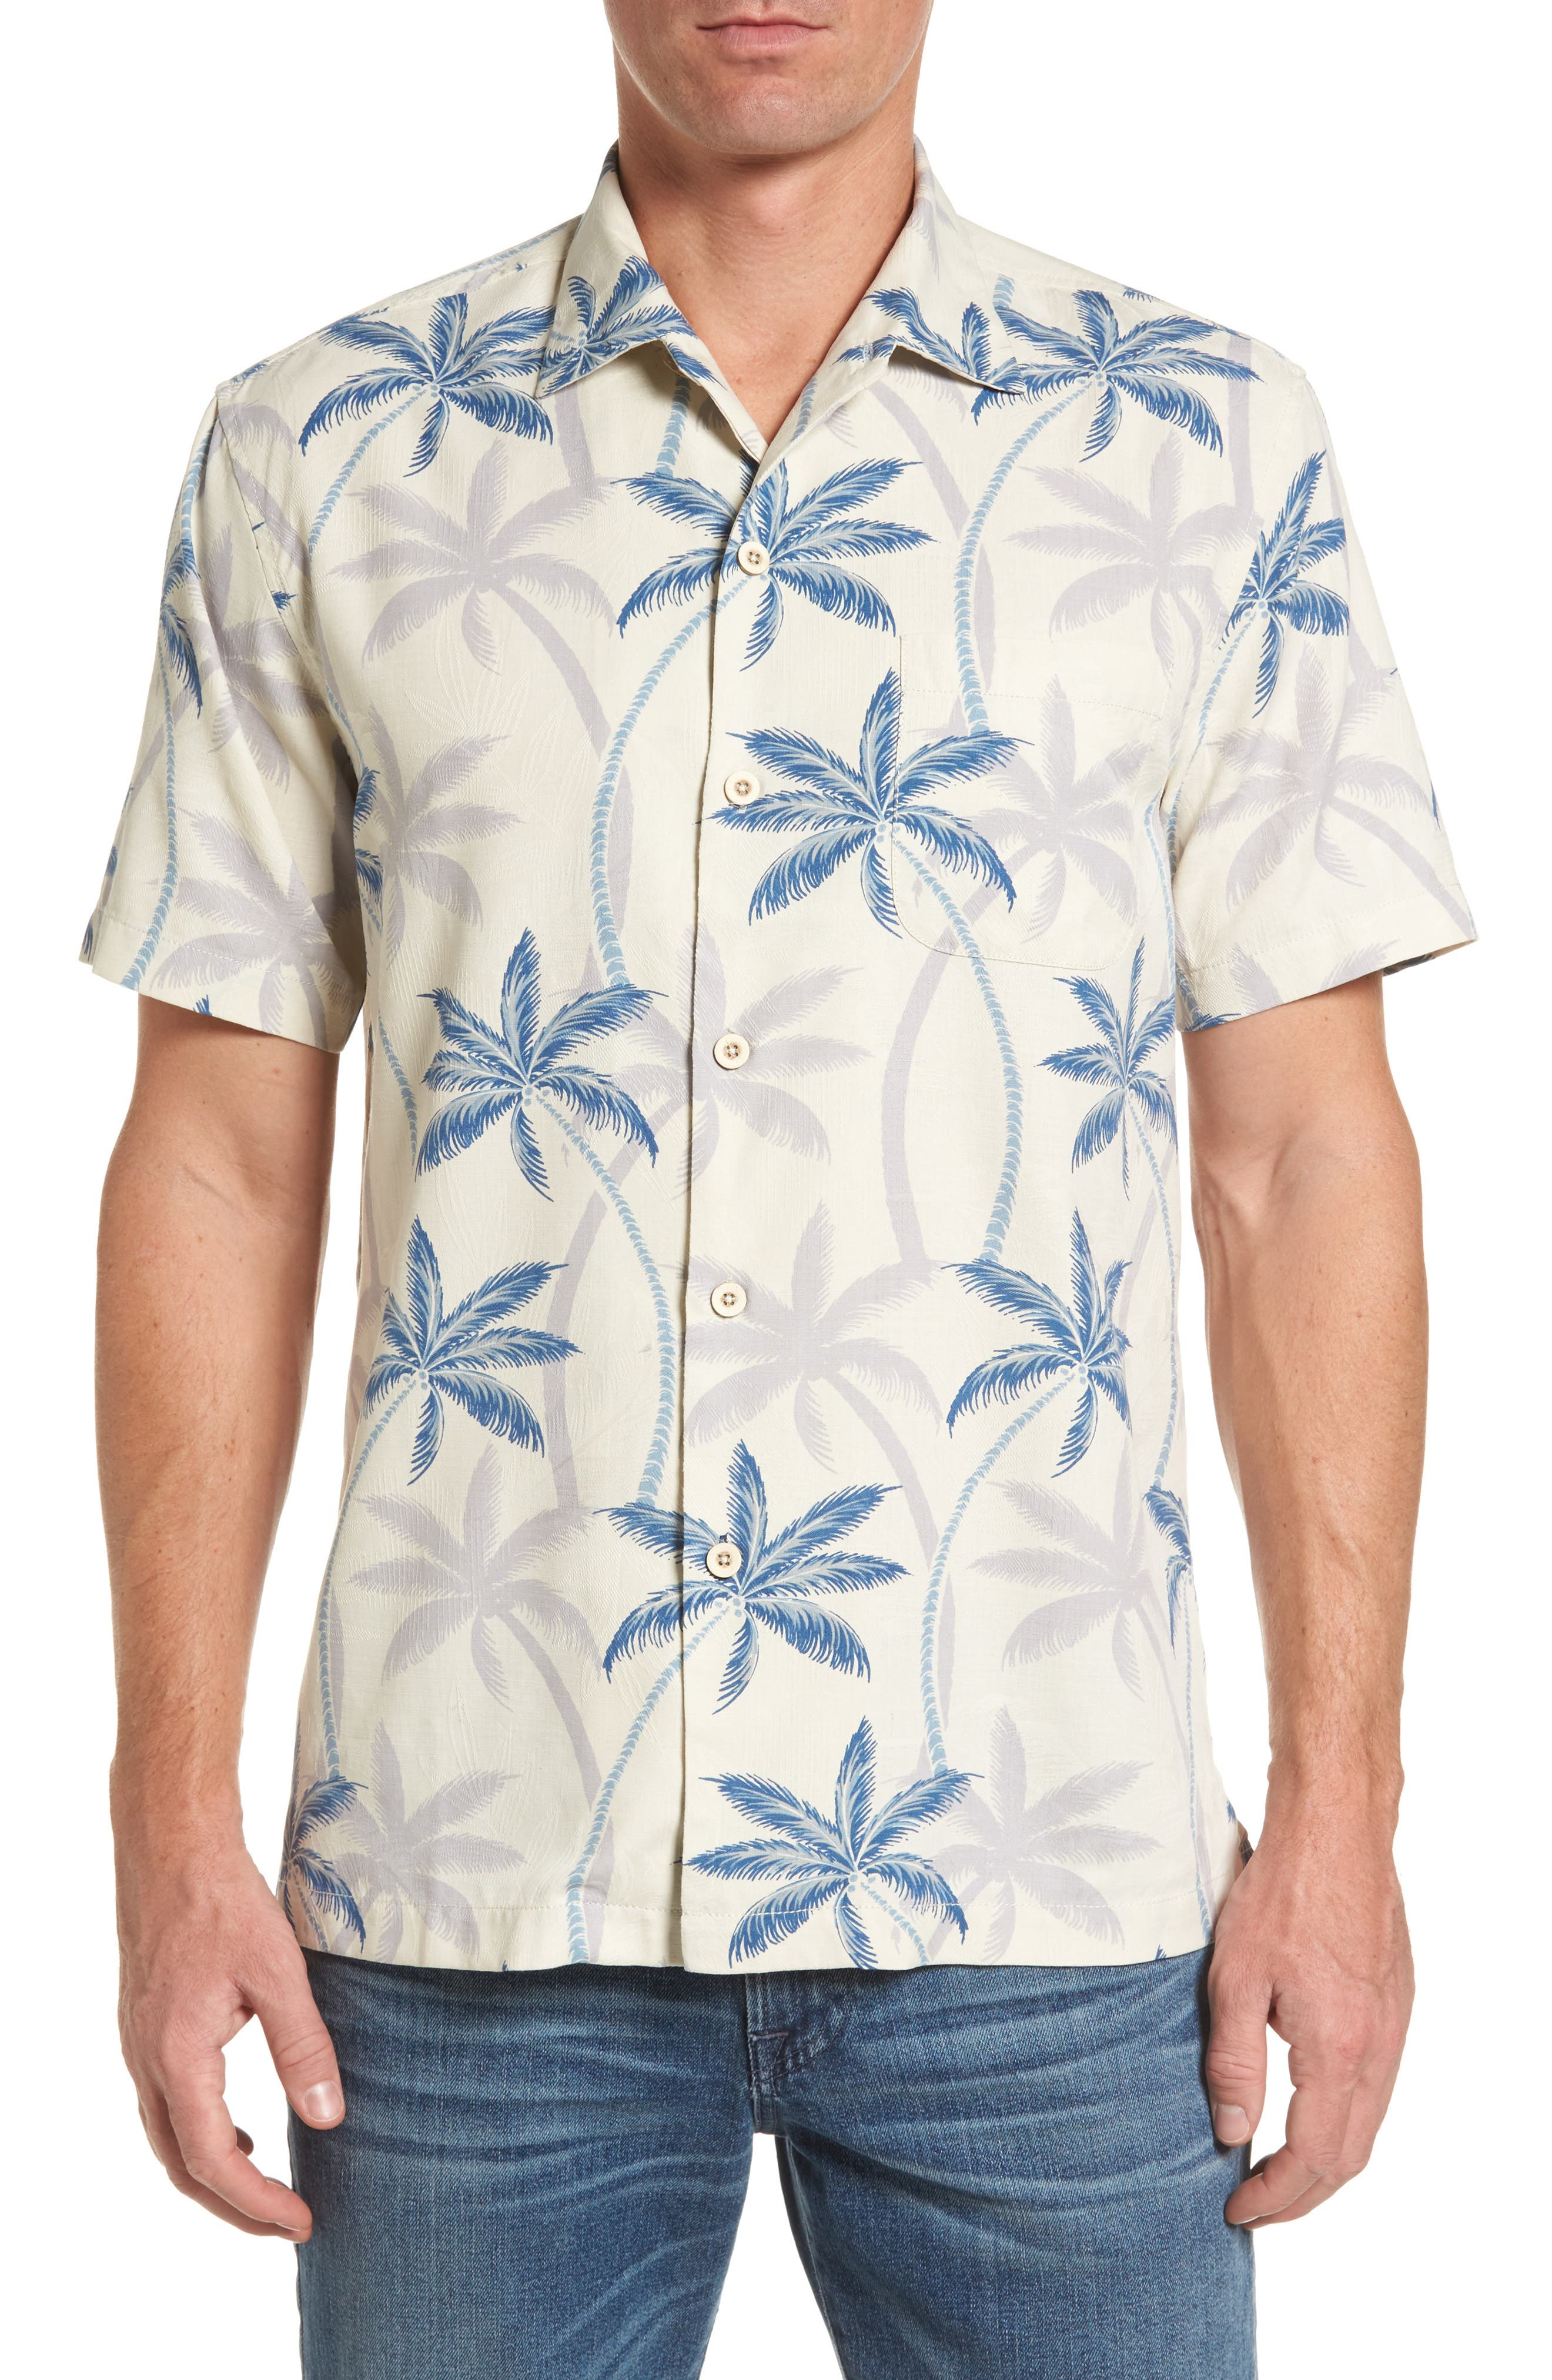 Palmas Palooza Woven Shirt,                         Main,                         color, 100